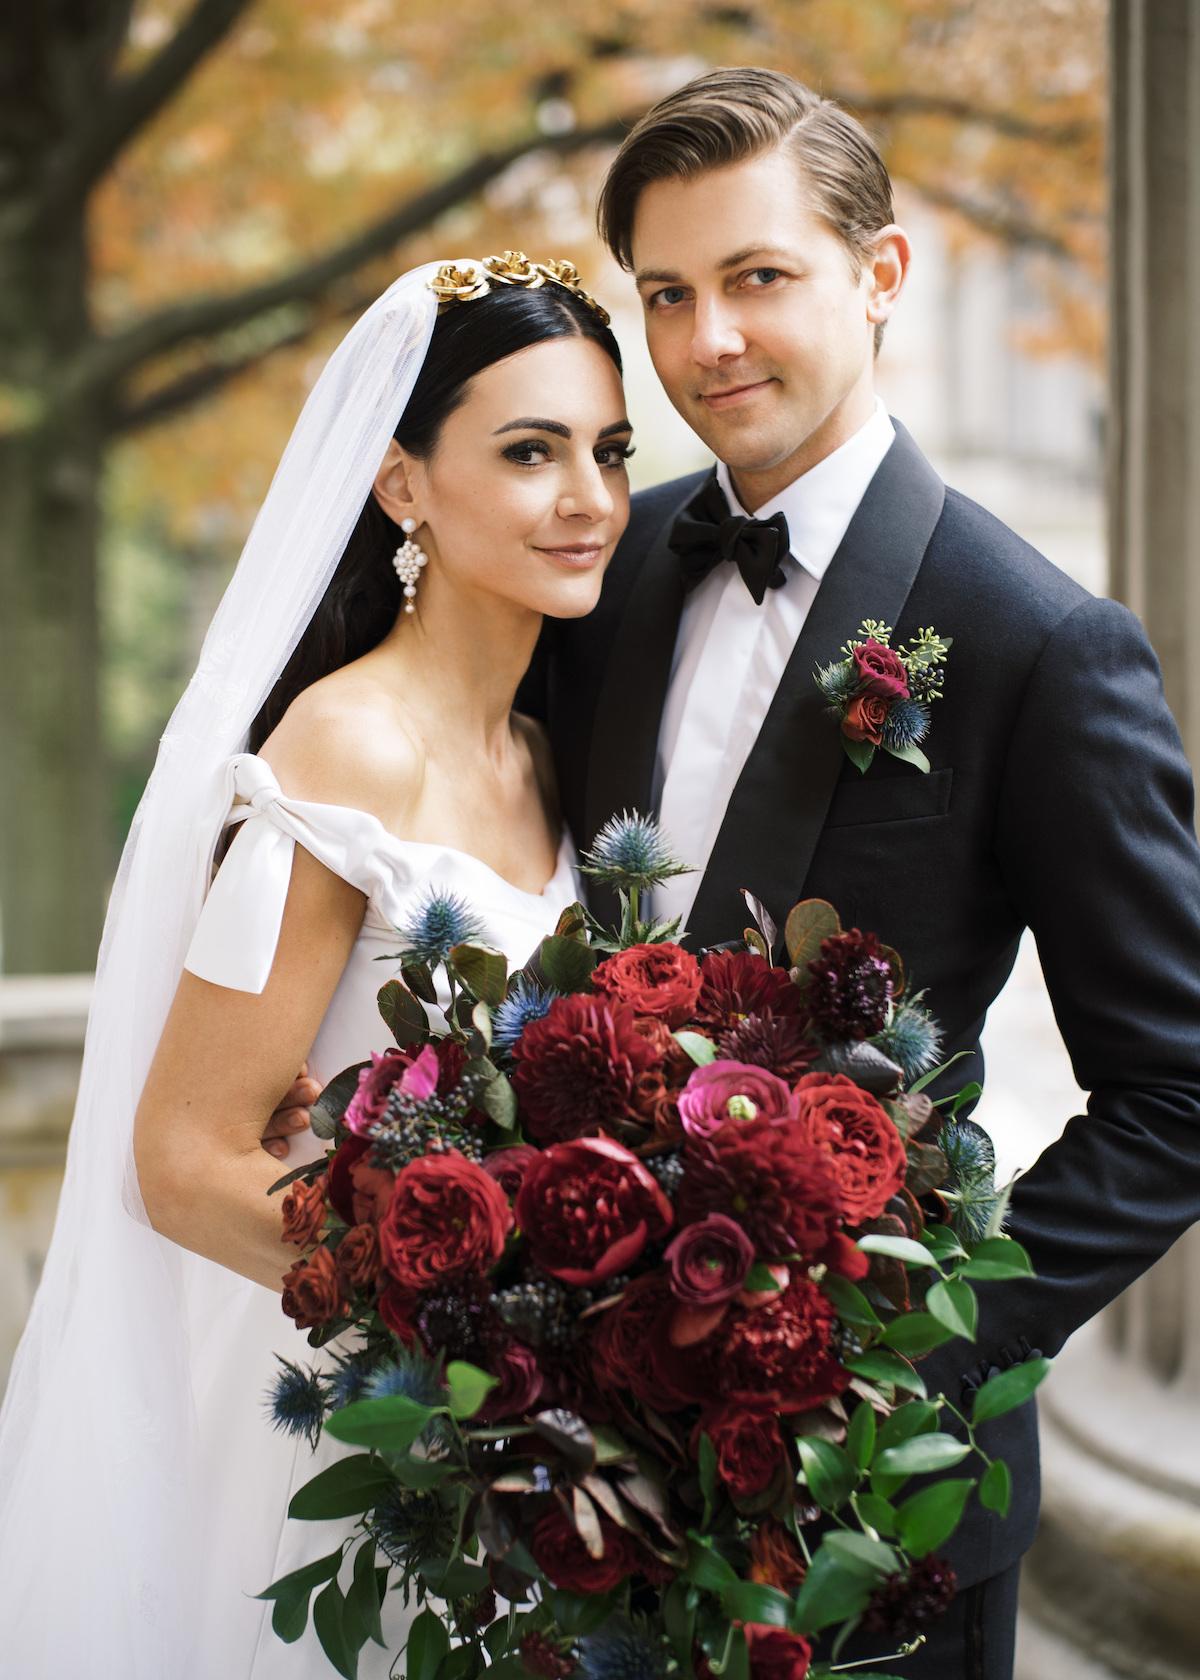 REAL BRIDE: THE FINEST ITALIAN SILK